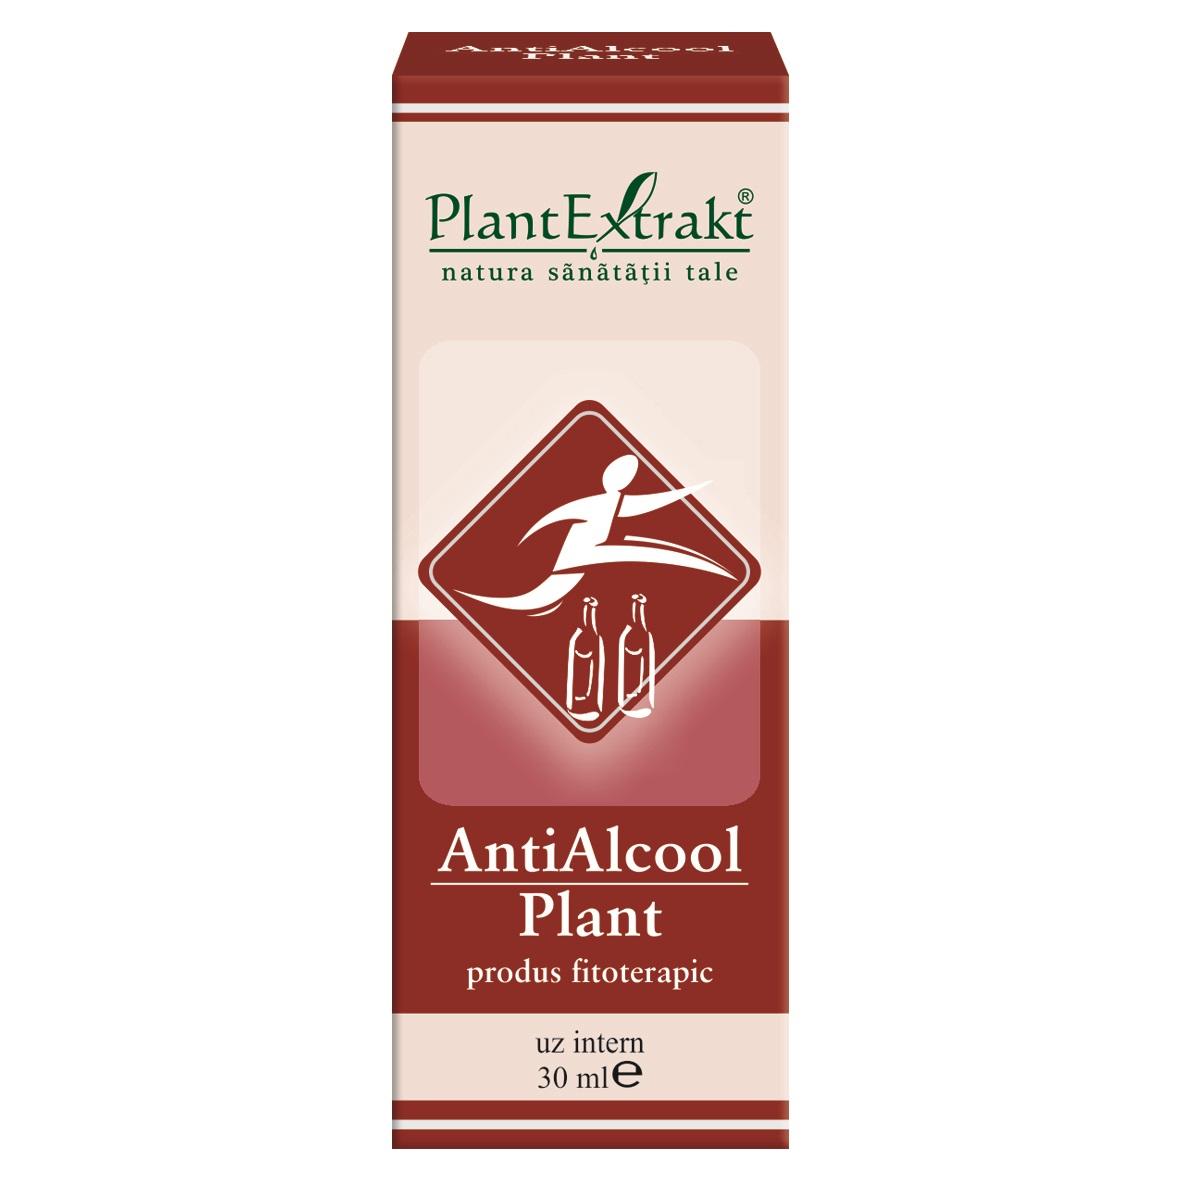 AntiAlcool Plant, 30 ml, Plant Extrakt